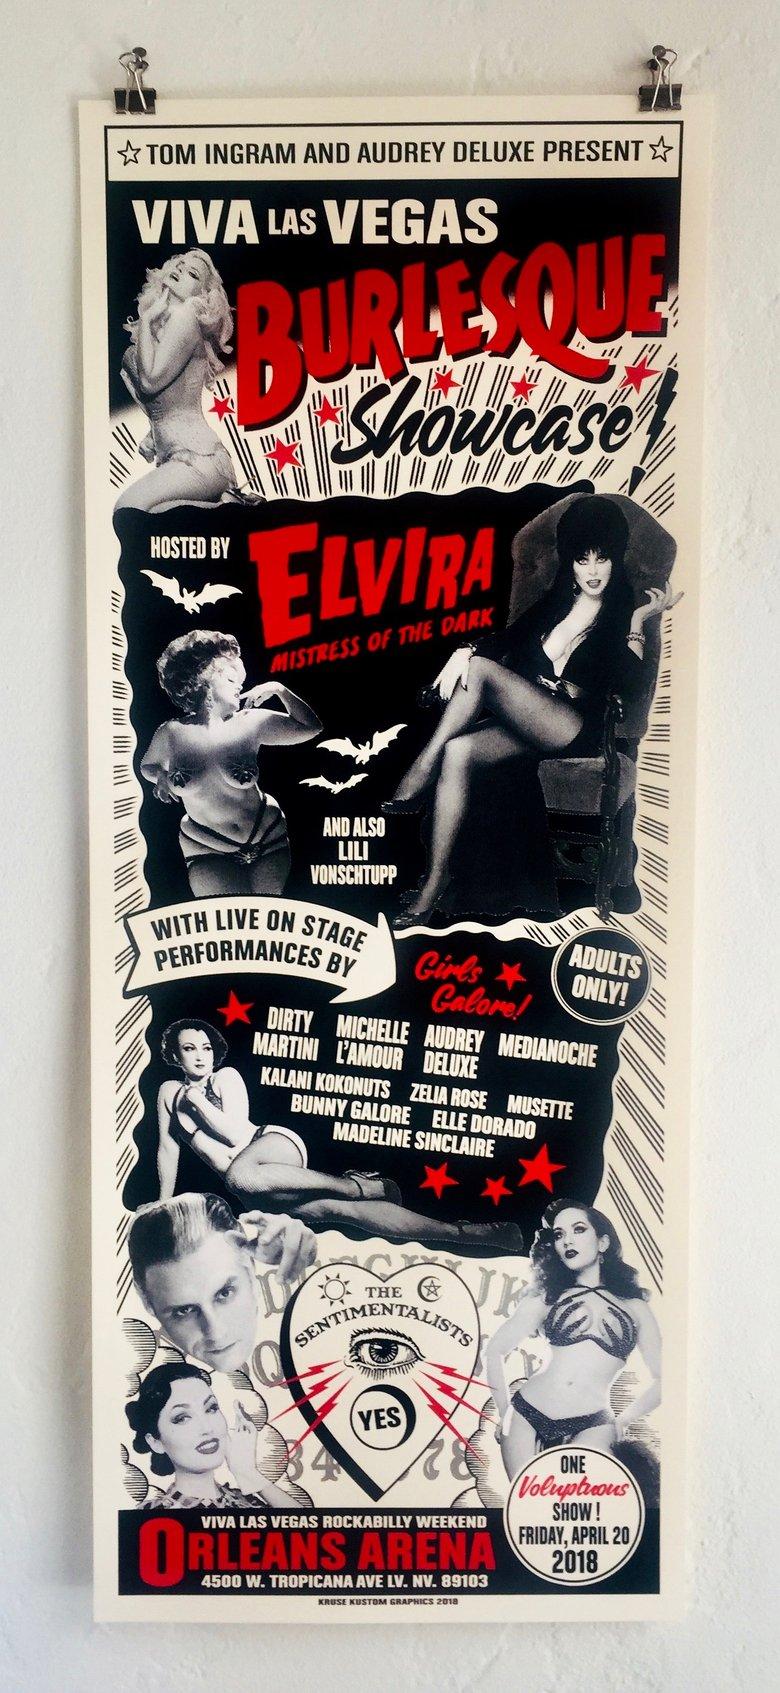 Image of Viva Las Vegas 21 Burlesque featuring Elvira